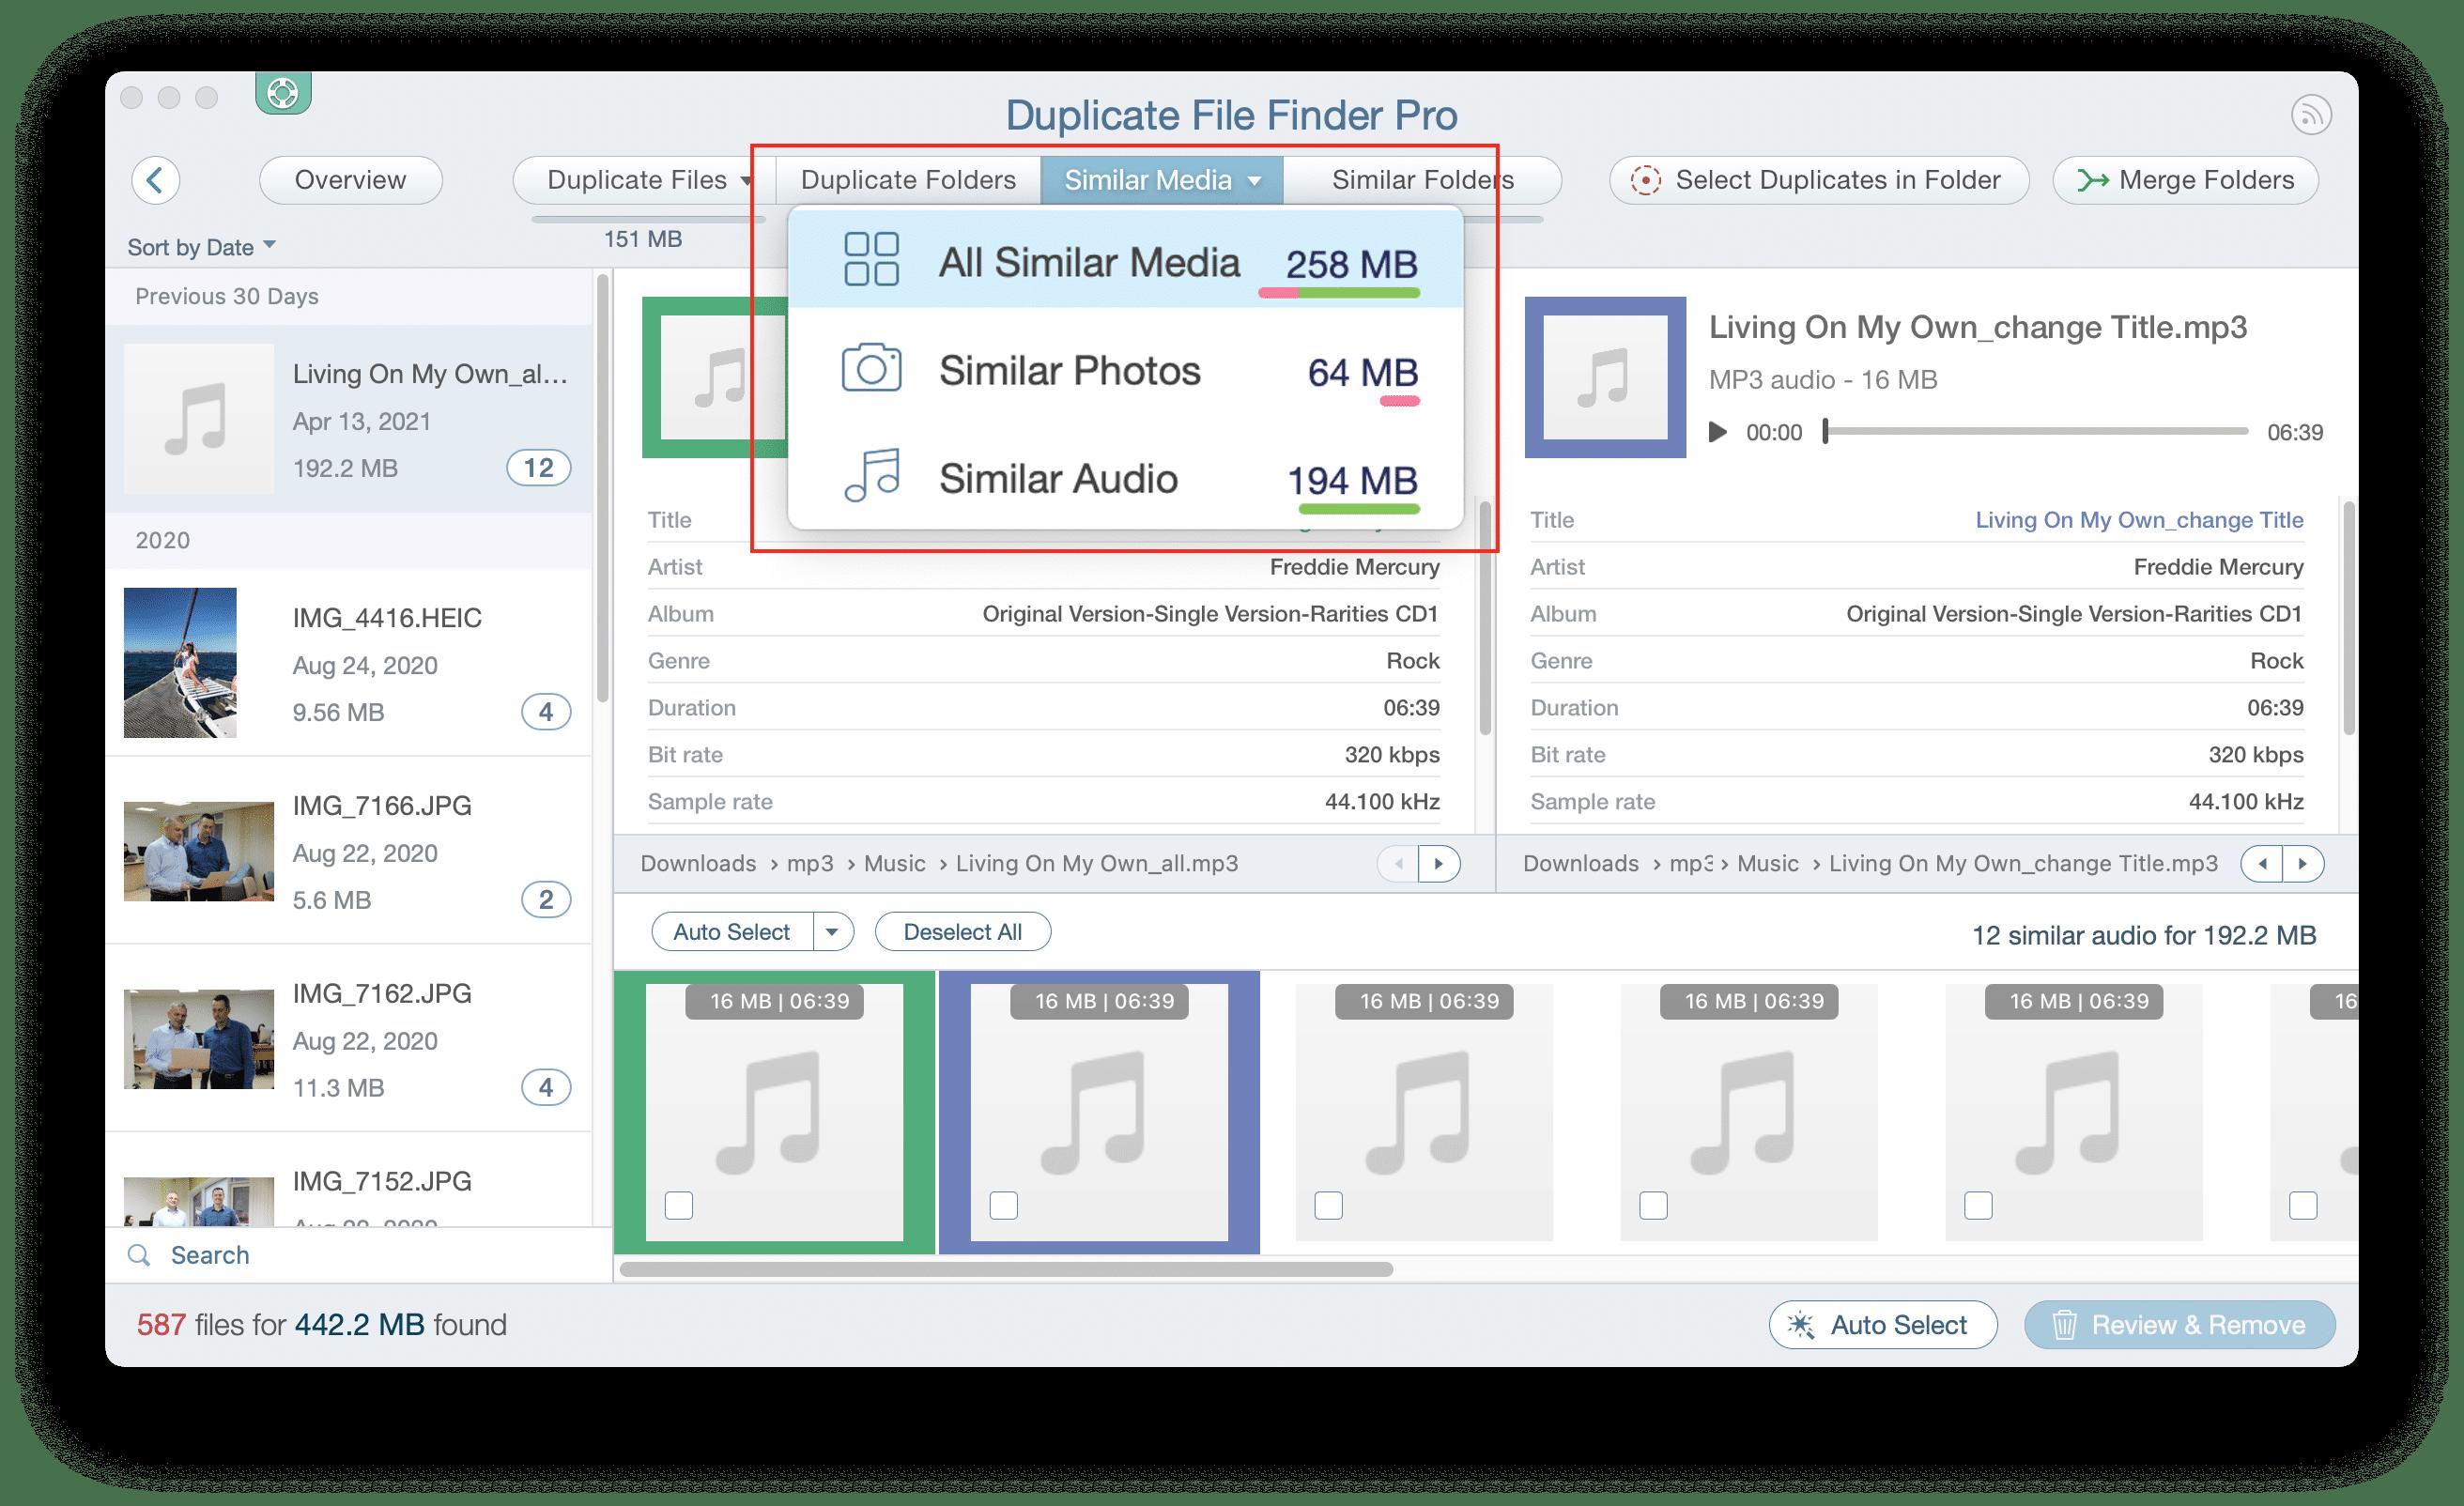 Duplicate File Finder showing Similar media files